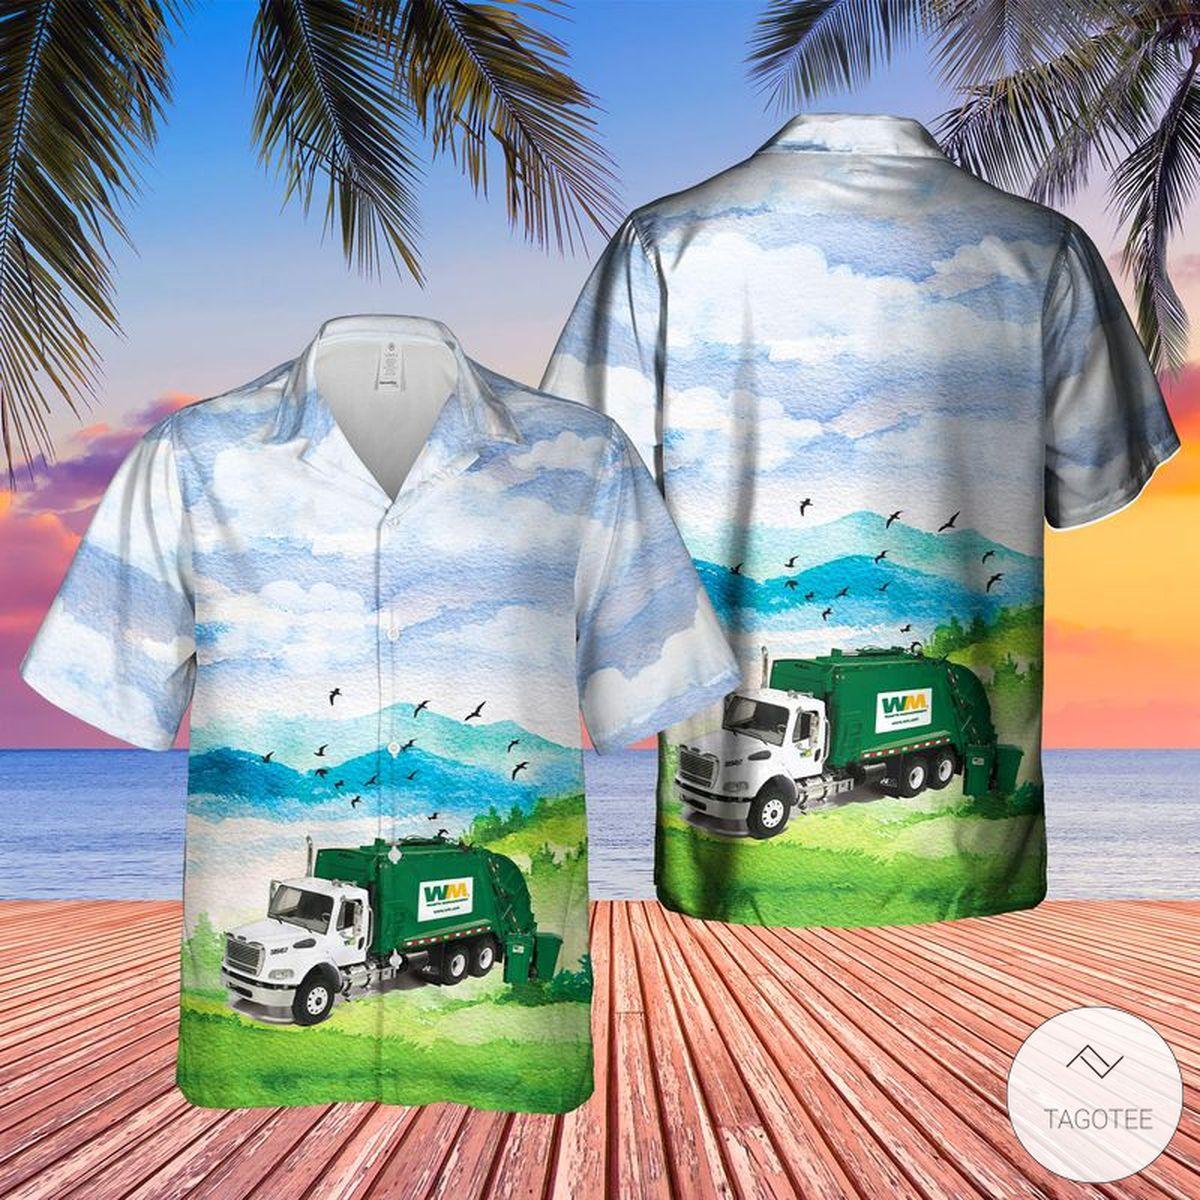 US Waste Management Garbage Roll-off Hawaiian Shirt